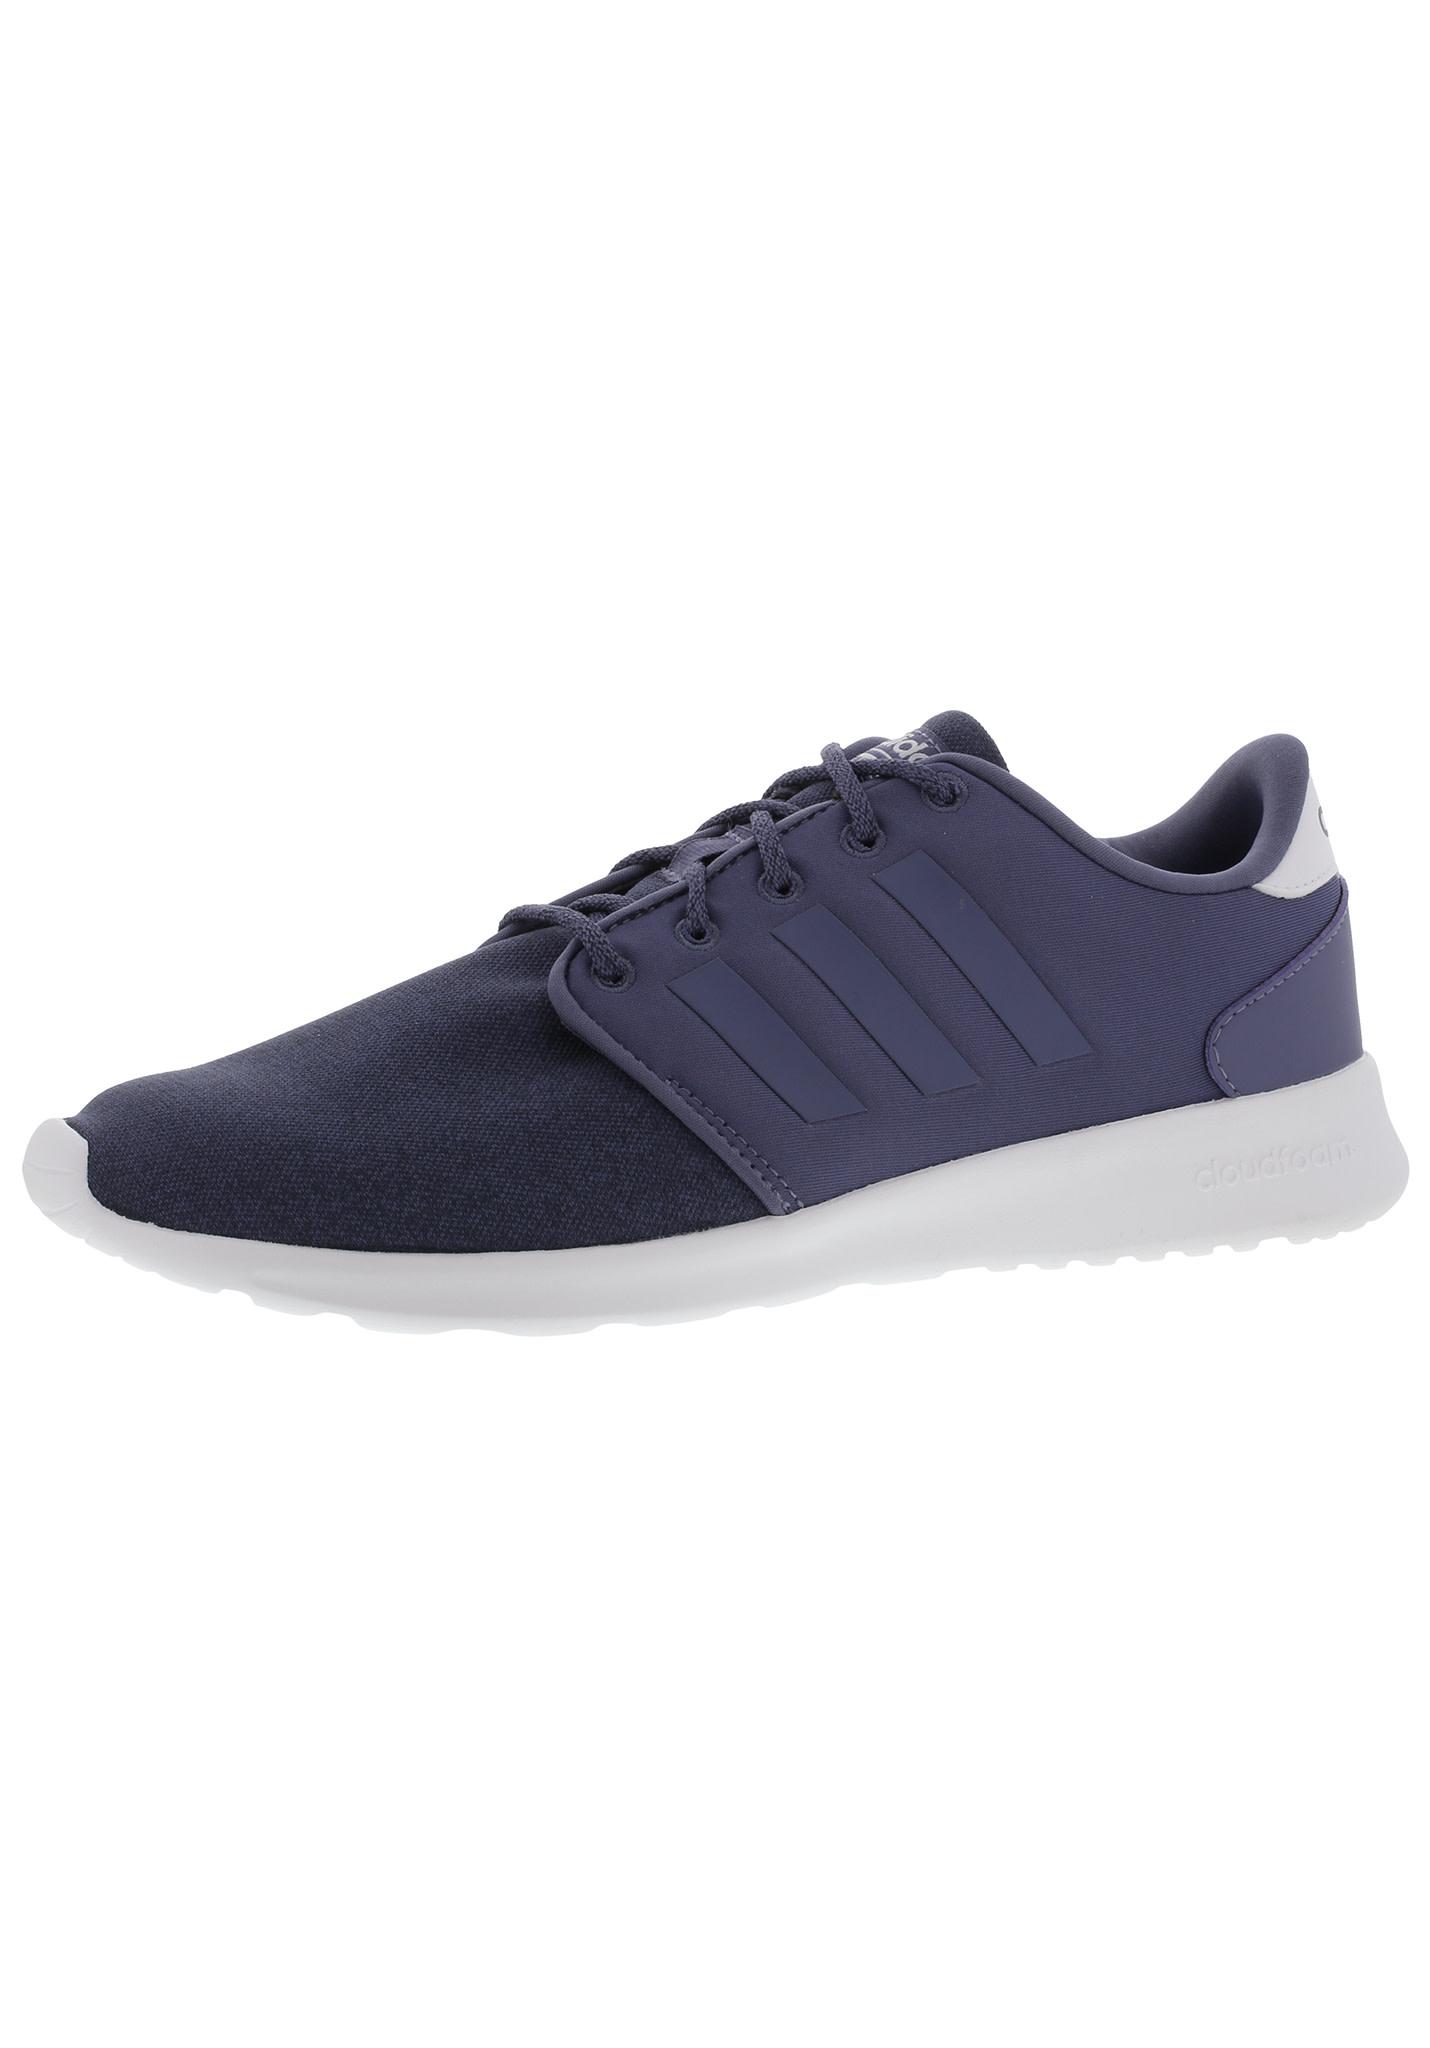 28101d826bb2 adidas Cf Qt Racer - Fitness shoes for Women - Purple